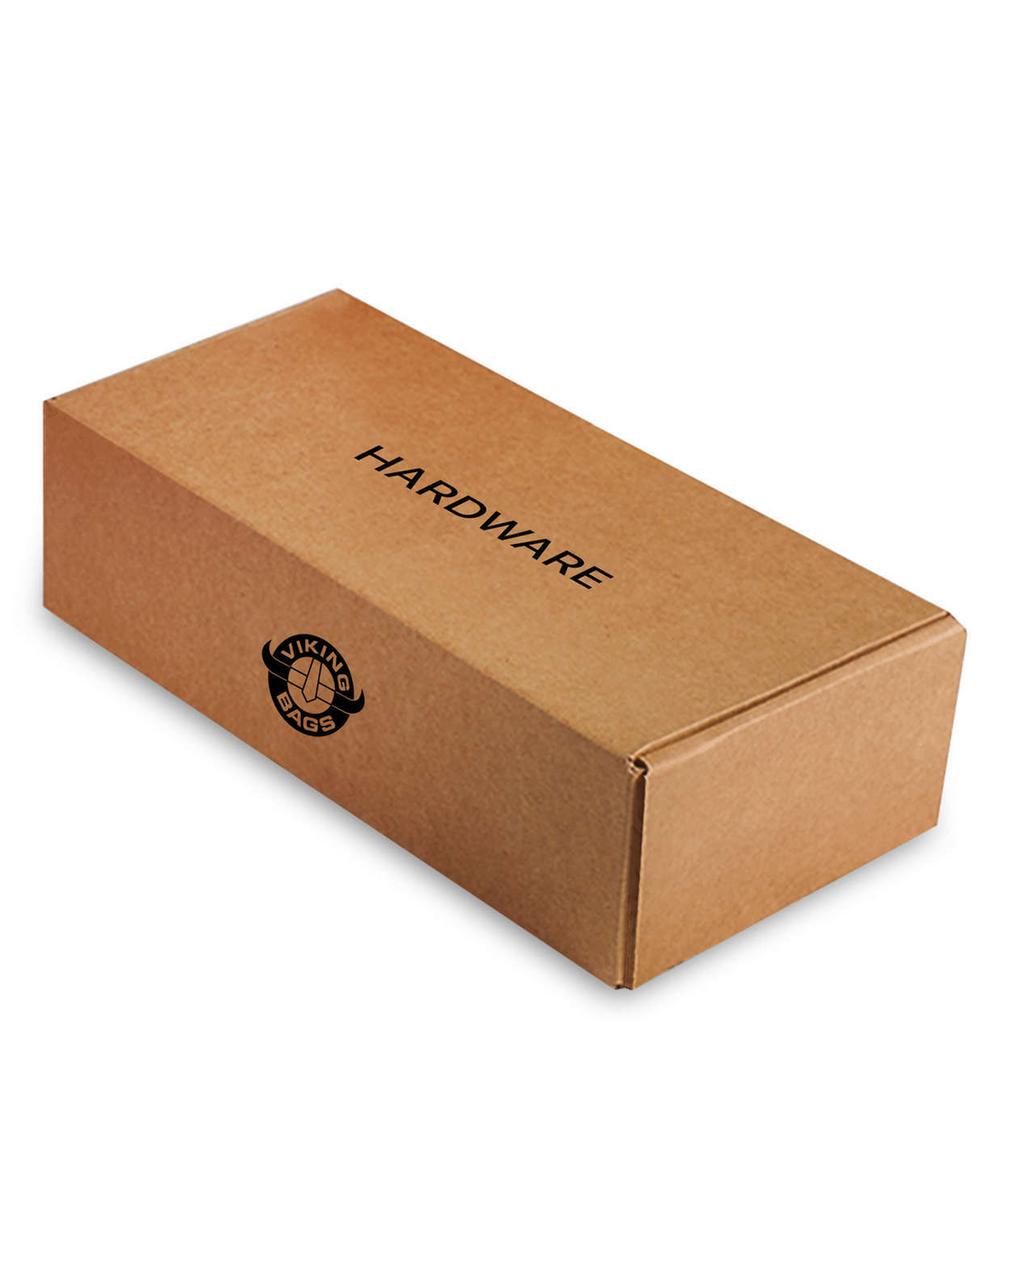 Triumph Rocket III Roadster Slanted Large Motorcycle Saddlebags Box